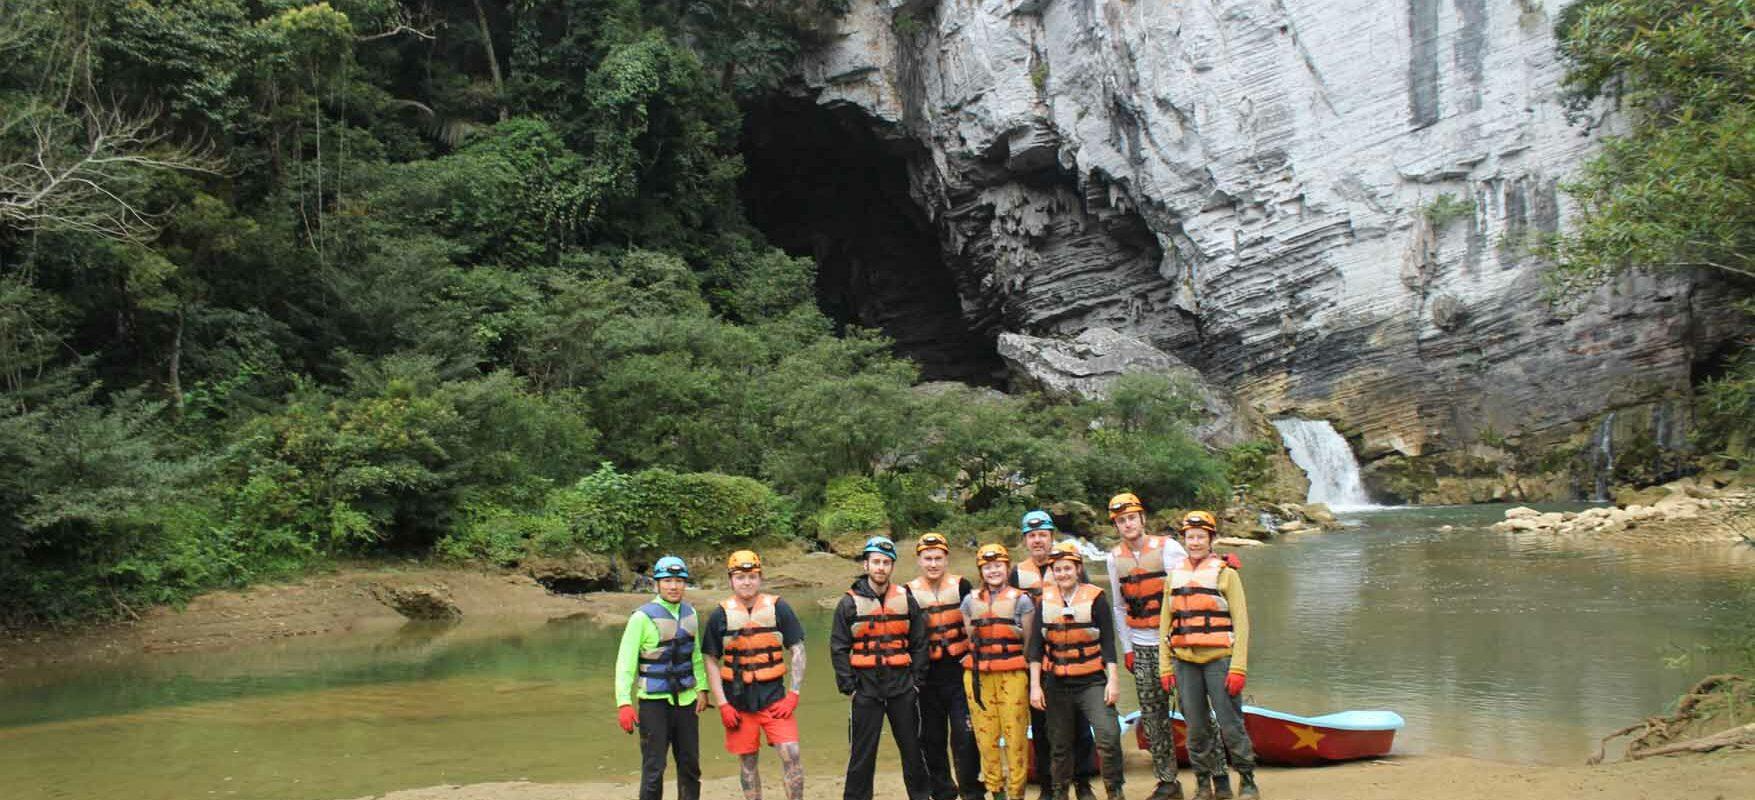 The Cloutmen cave trekking in Phong Nha